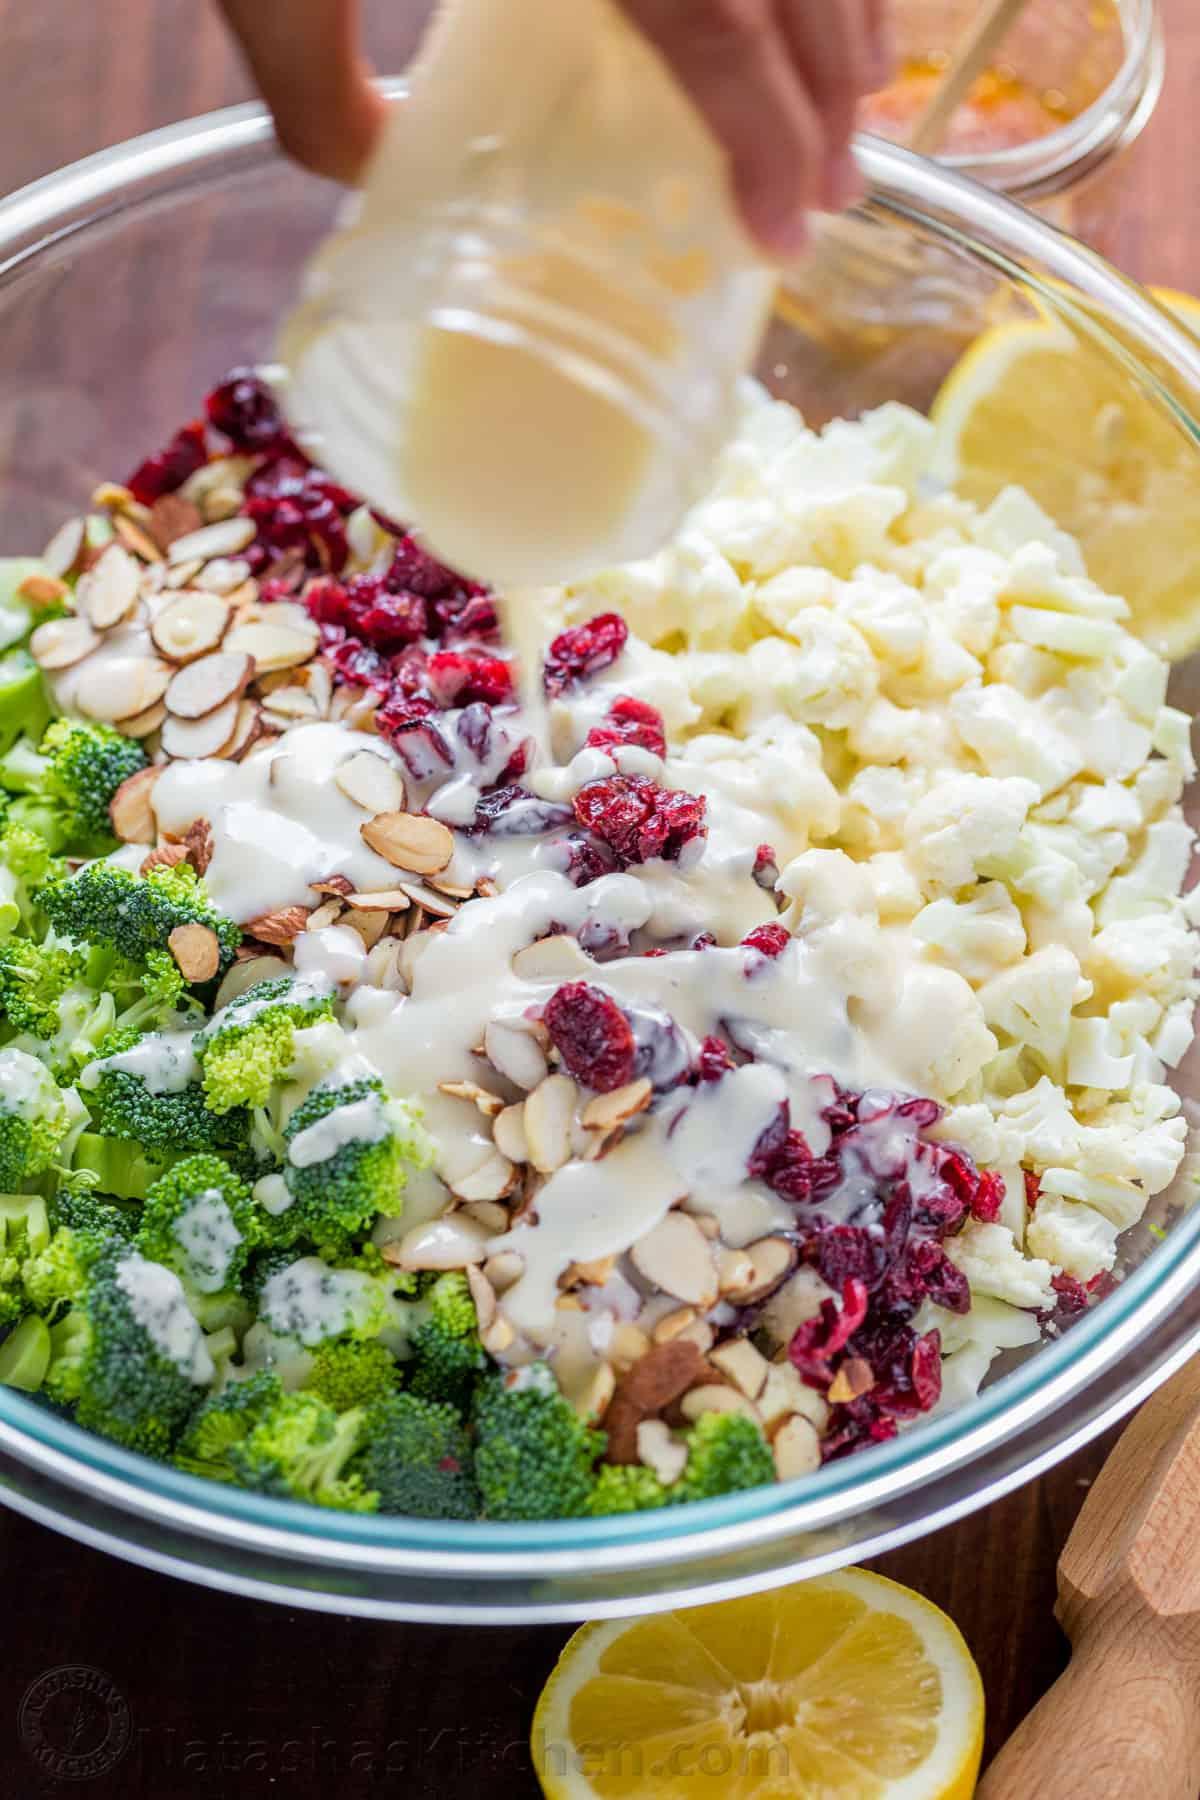 how to prepare broccoli salad